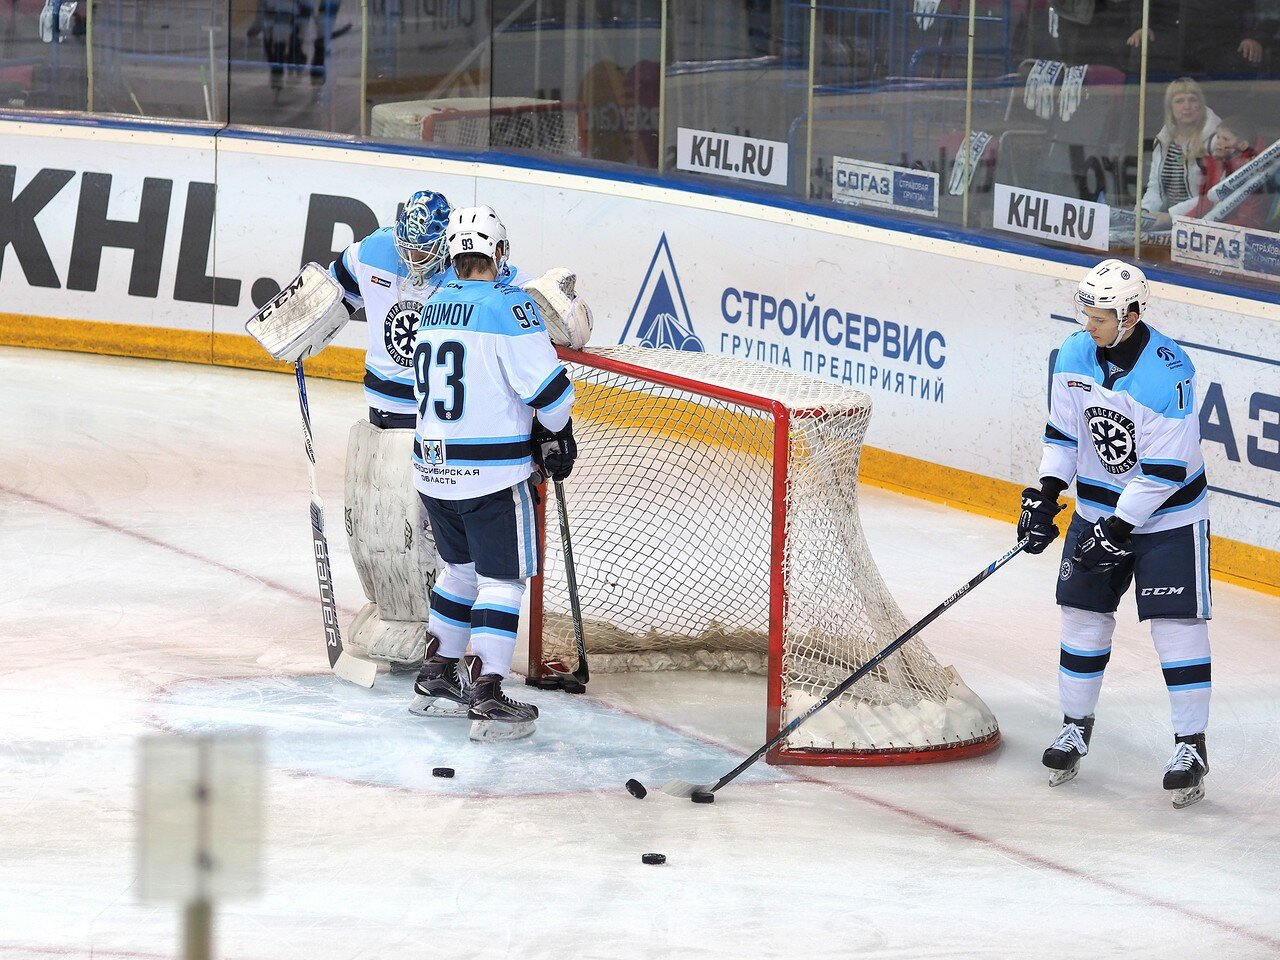 10Плей-офф 2016 Восток 1/2 Металлург - Сибирь 16.03.2016